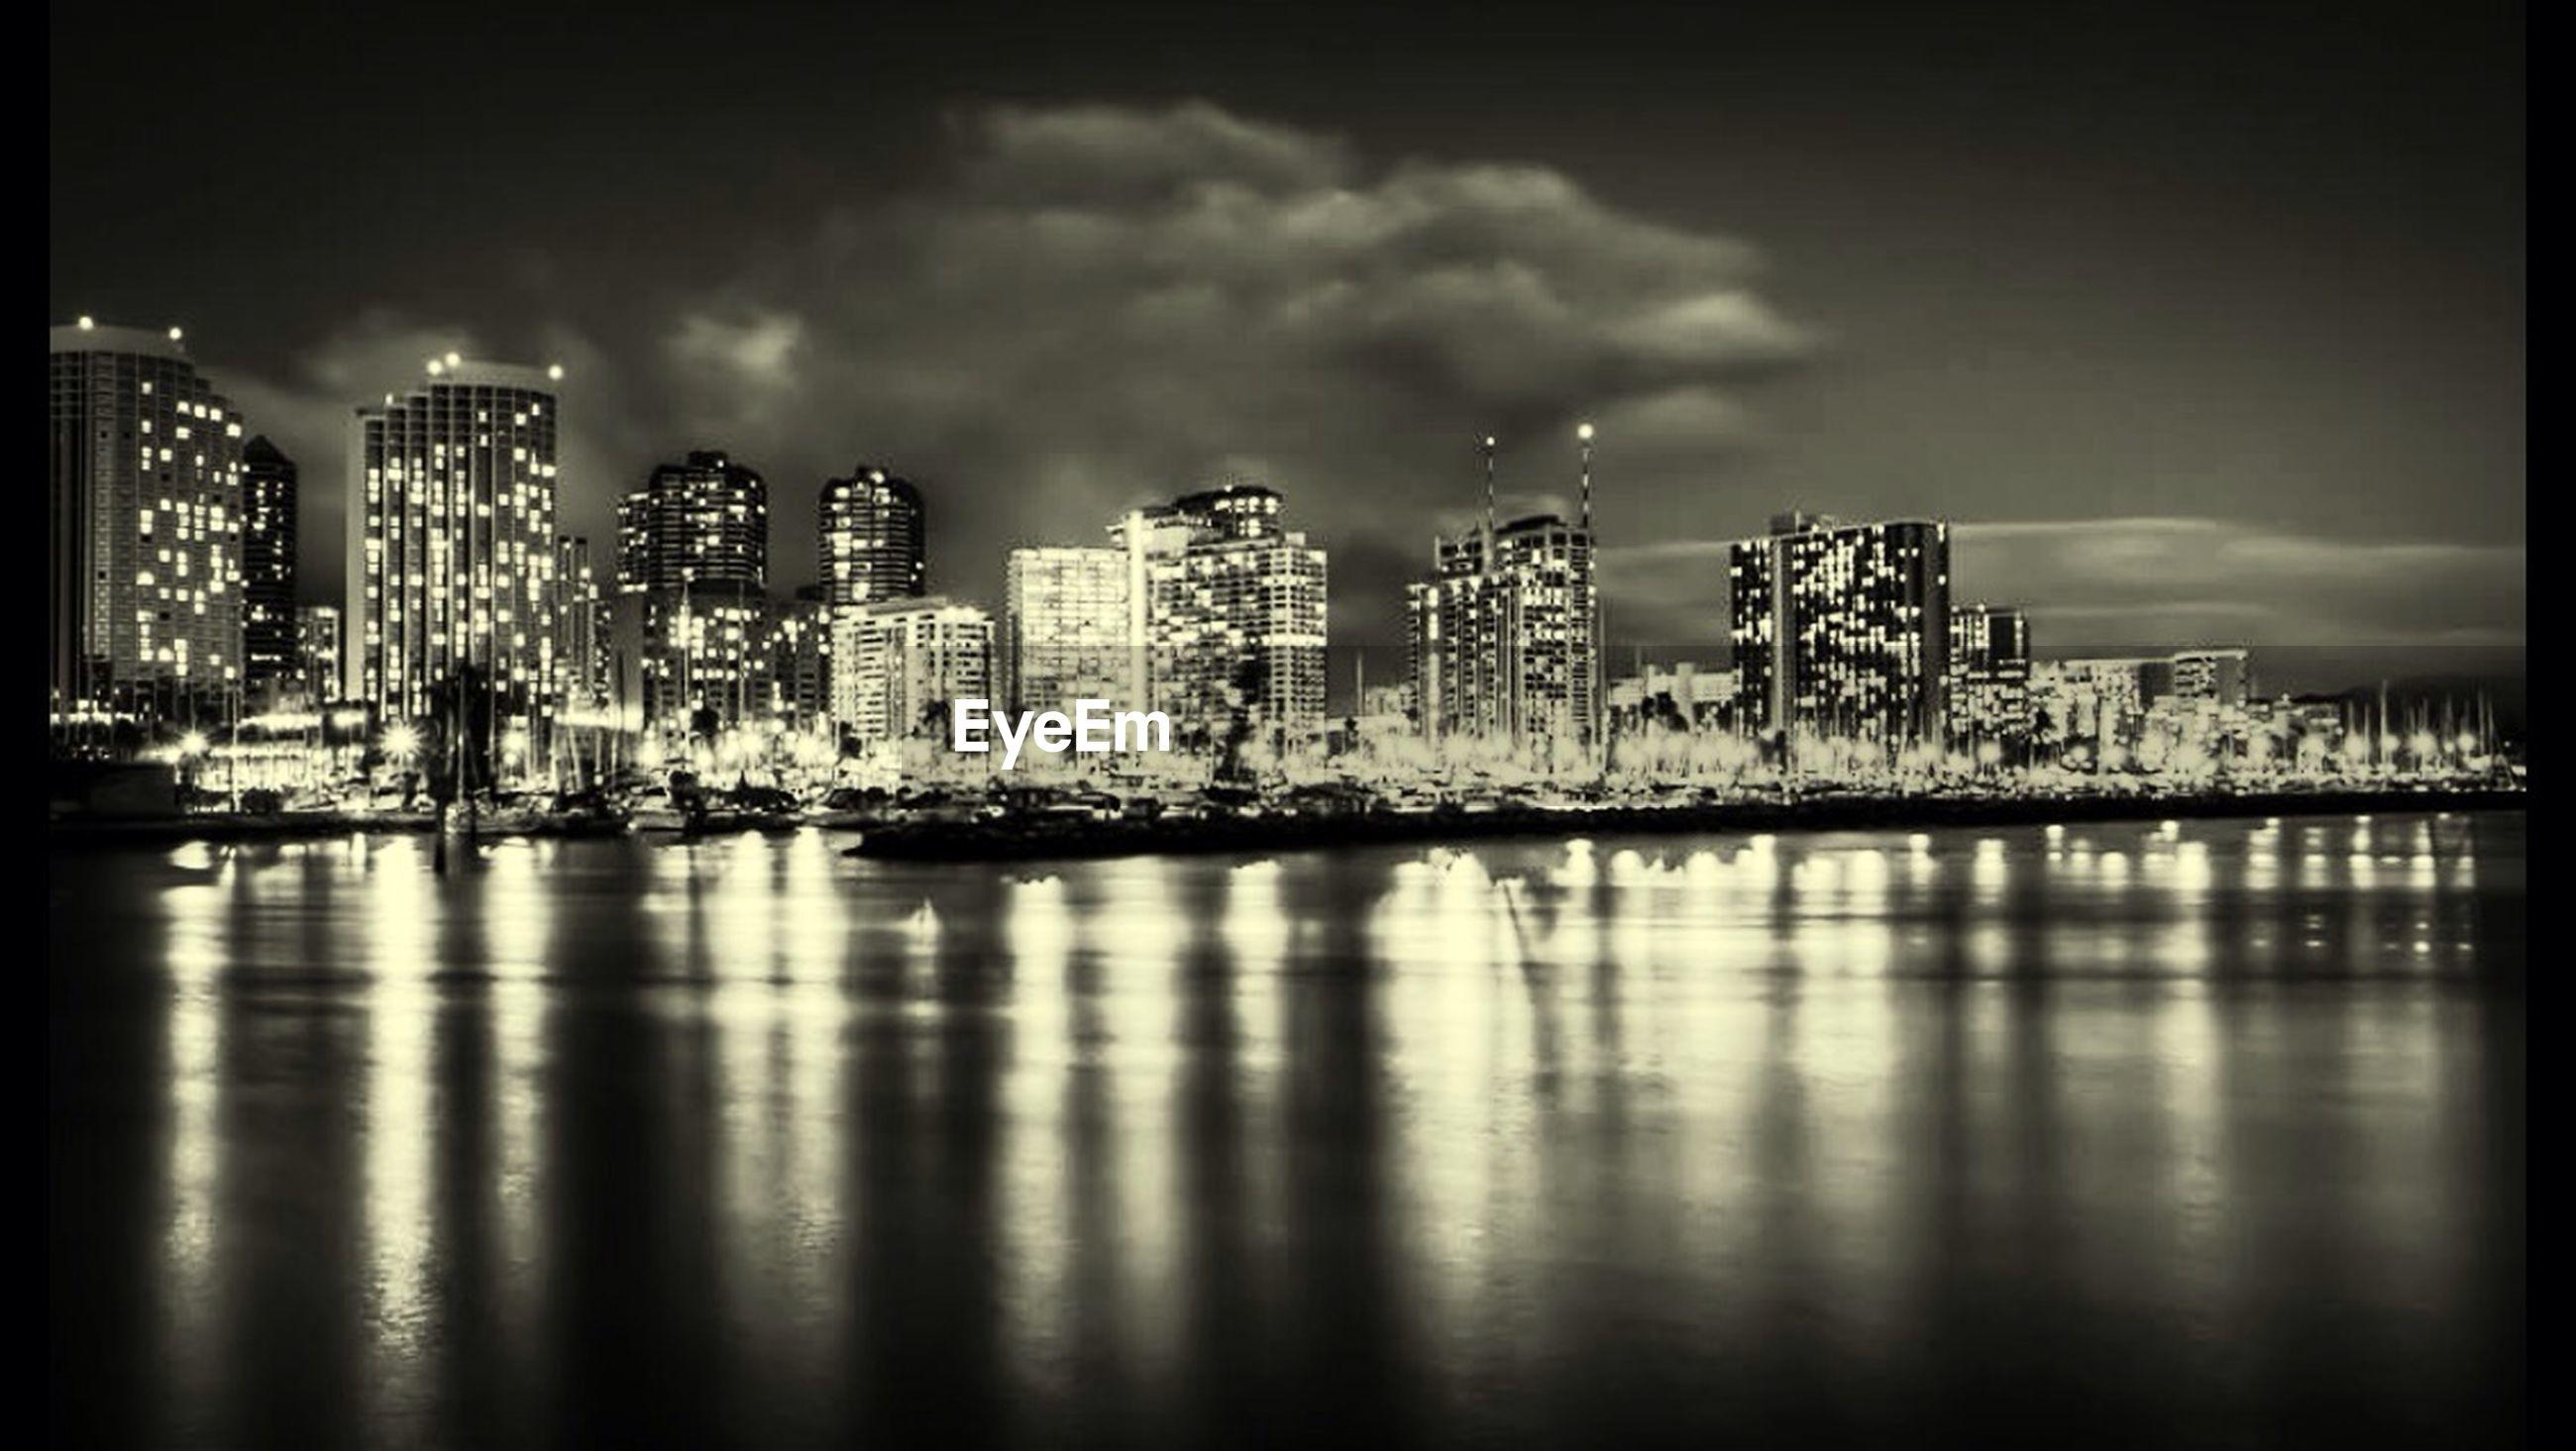 Illuminated cityscape and river